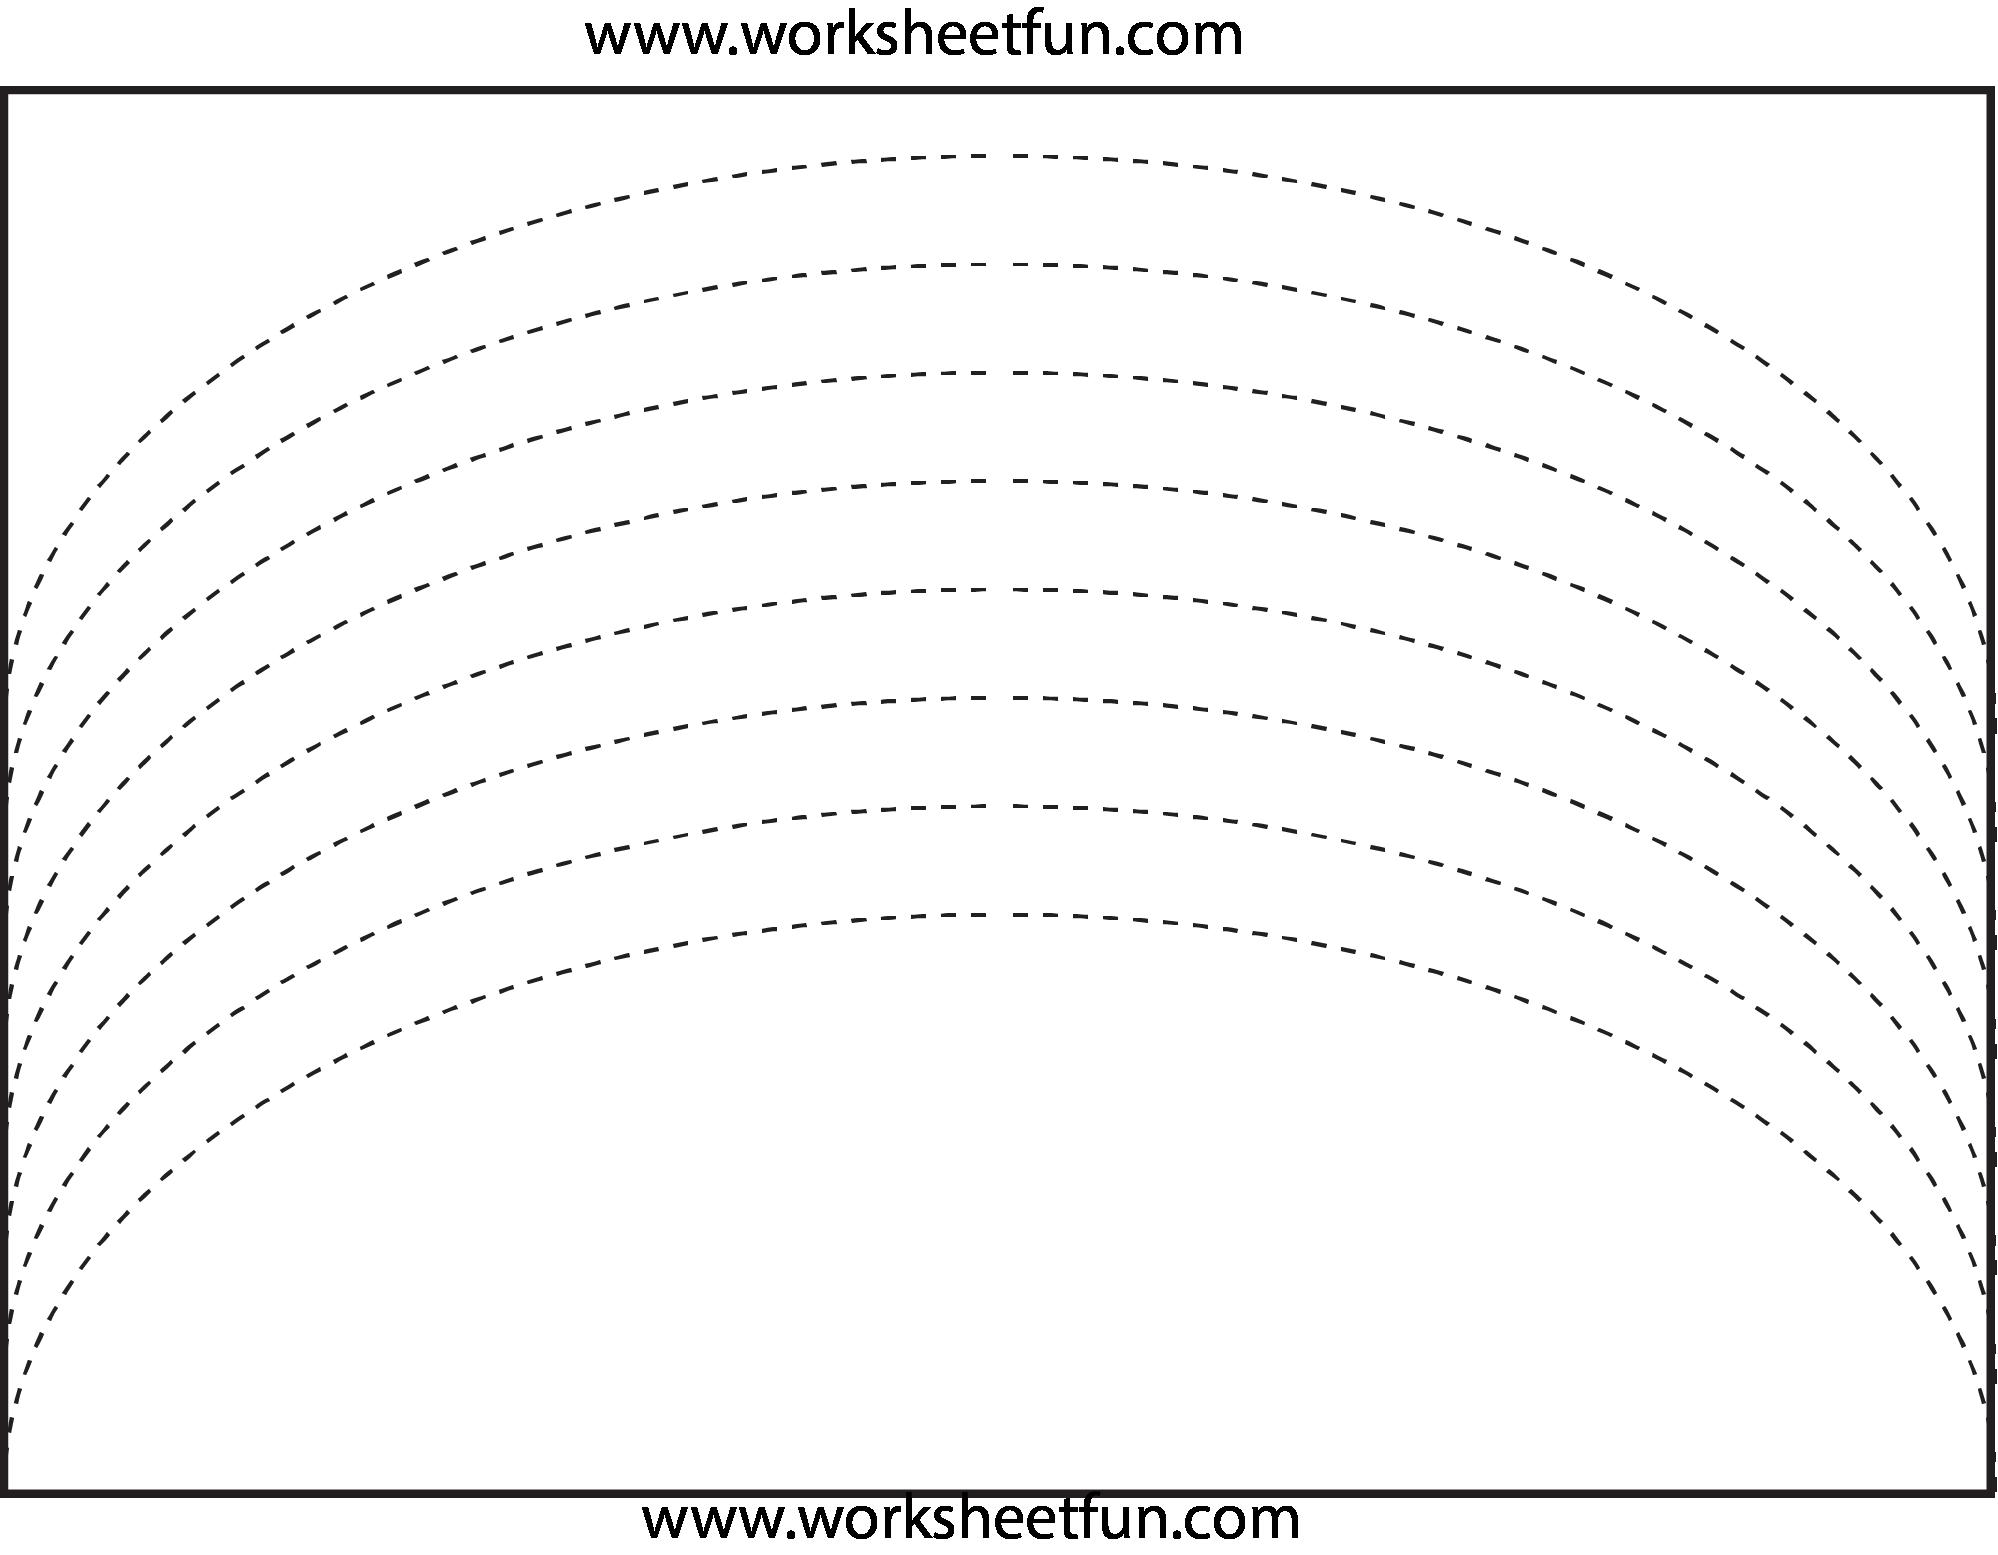 Curved Line Tracing Preschool Worksheets Tracing Worksheets Preschool Preschool [ 1555 x 1998 Pixel ]